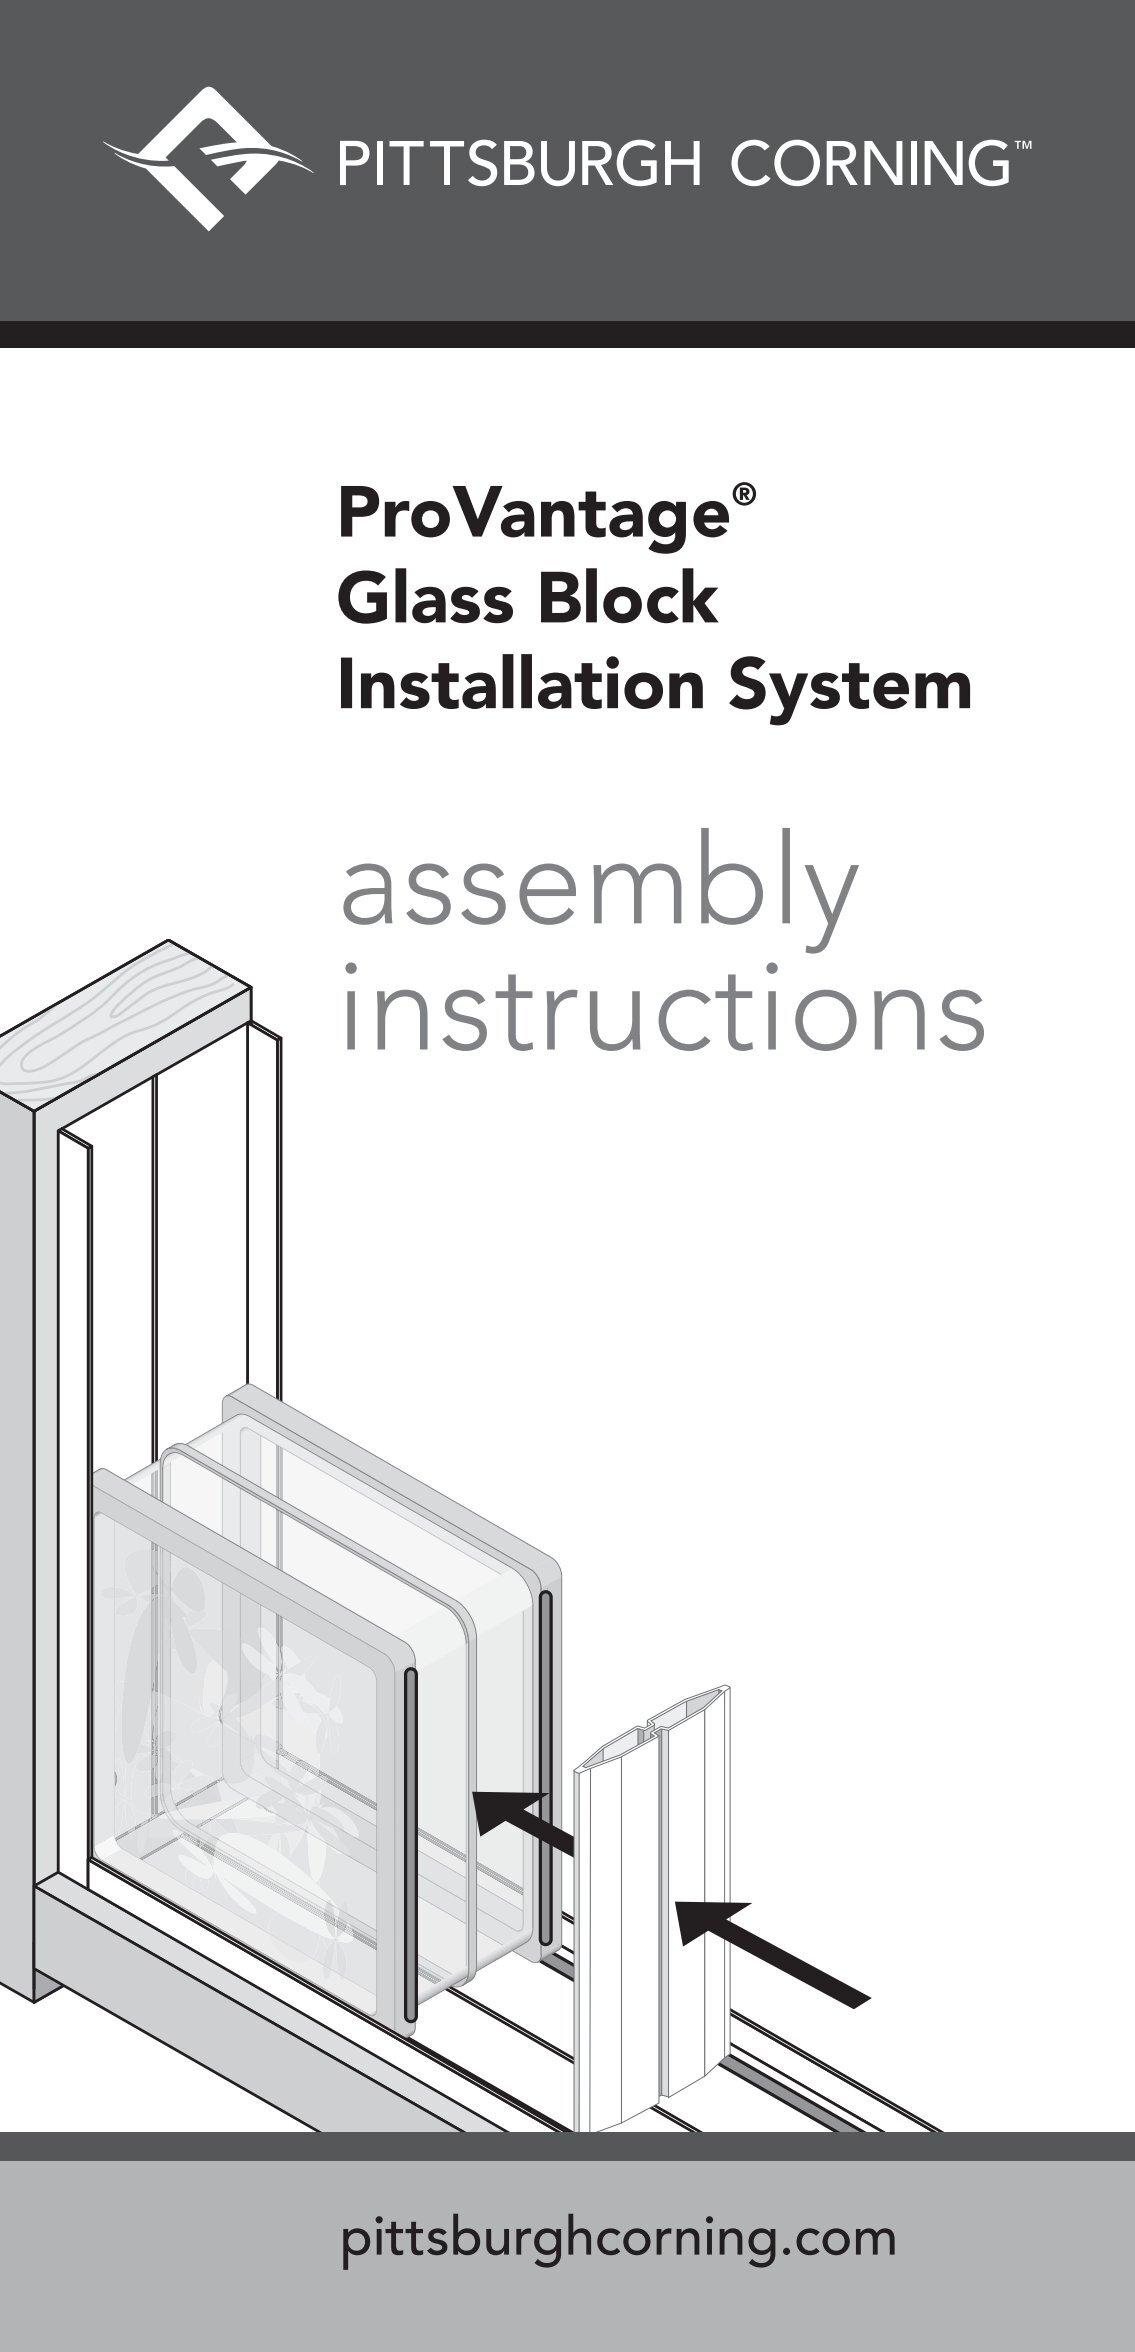 Provantage glass block installation system pittsburgh corning.